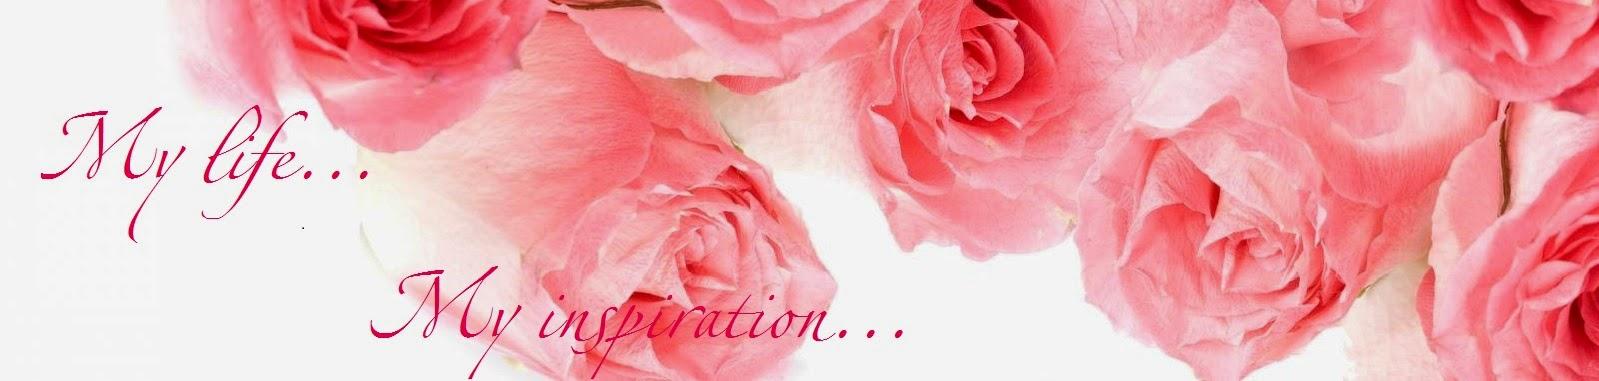 My life... My inspiration...